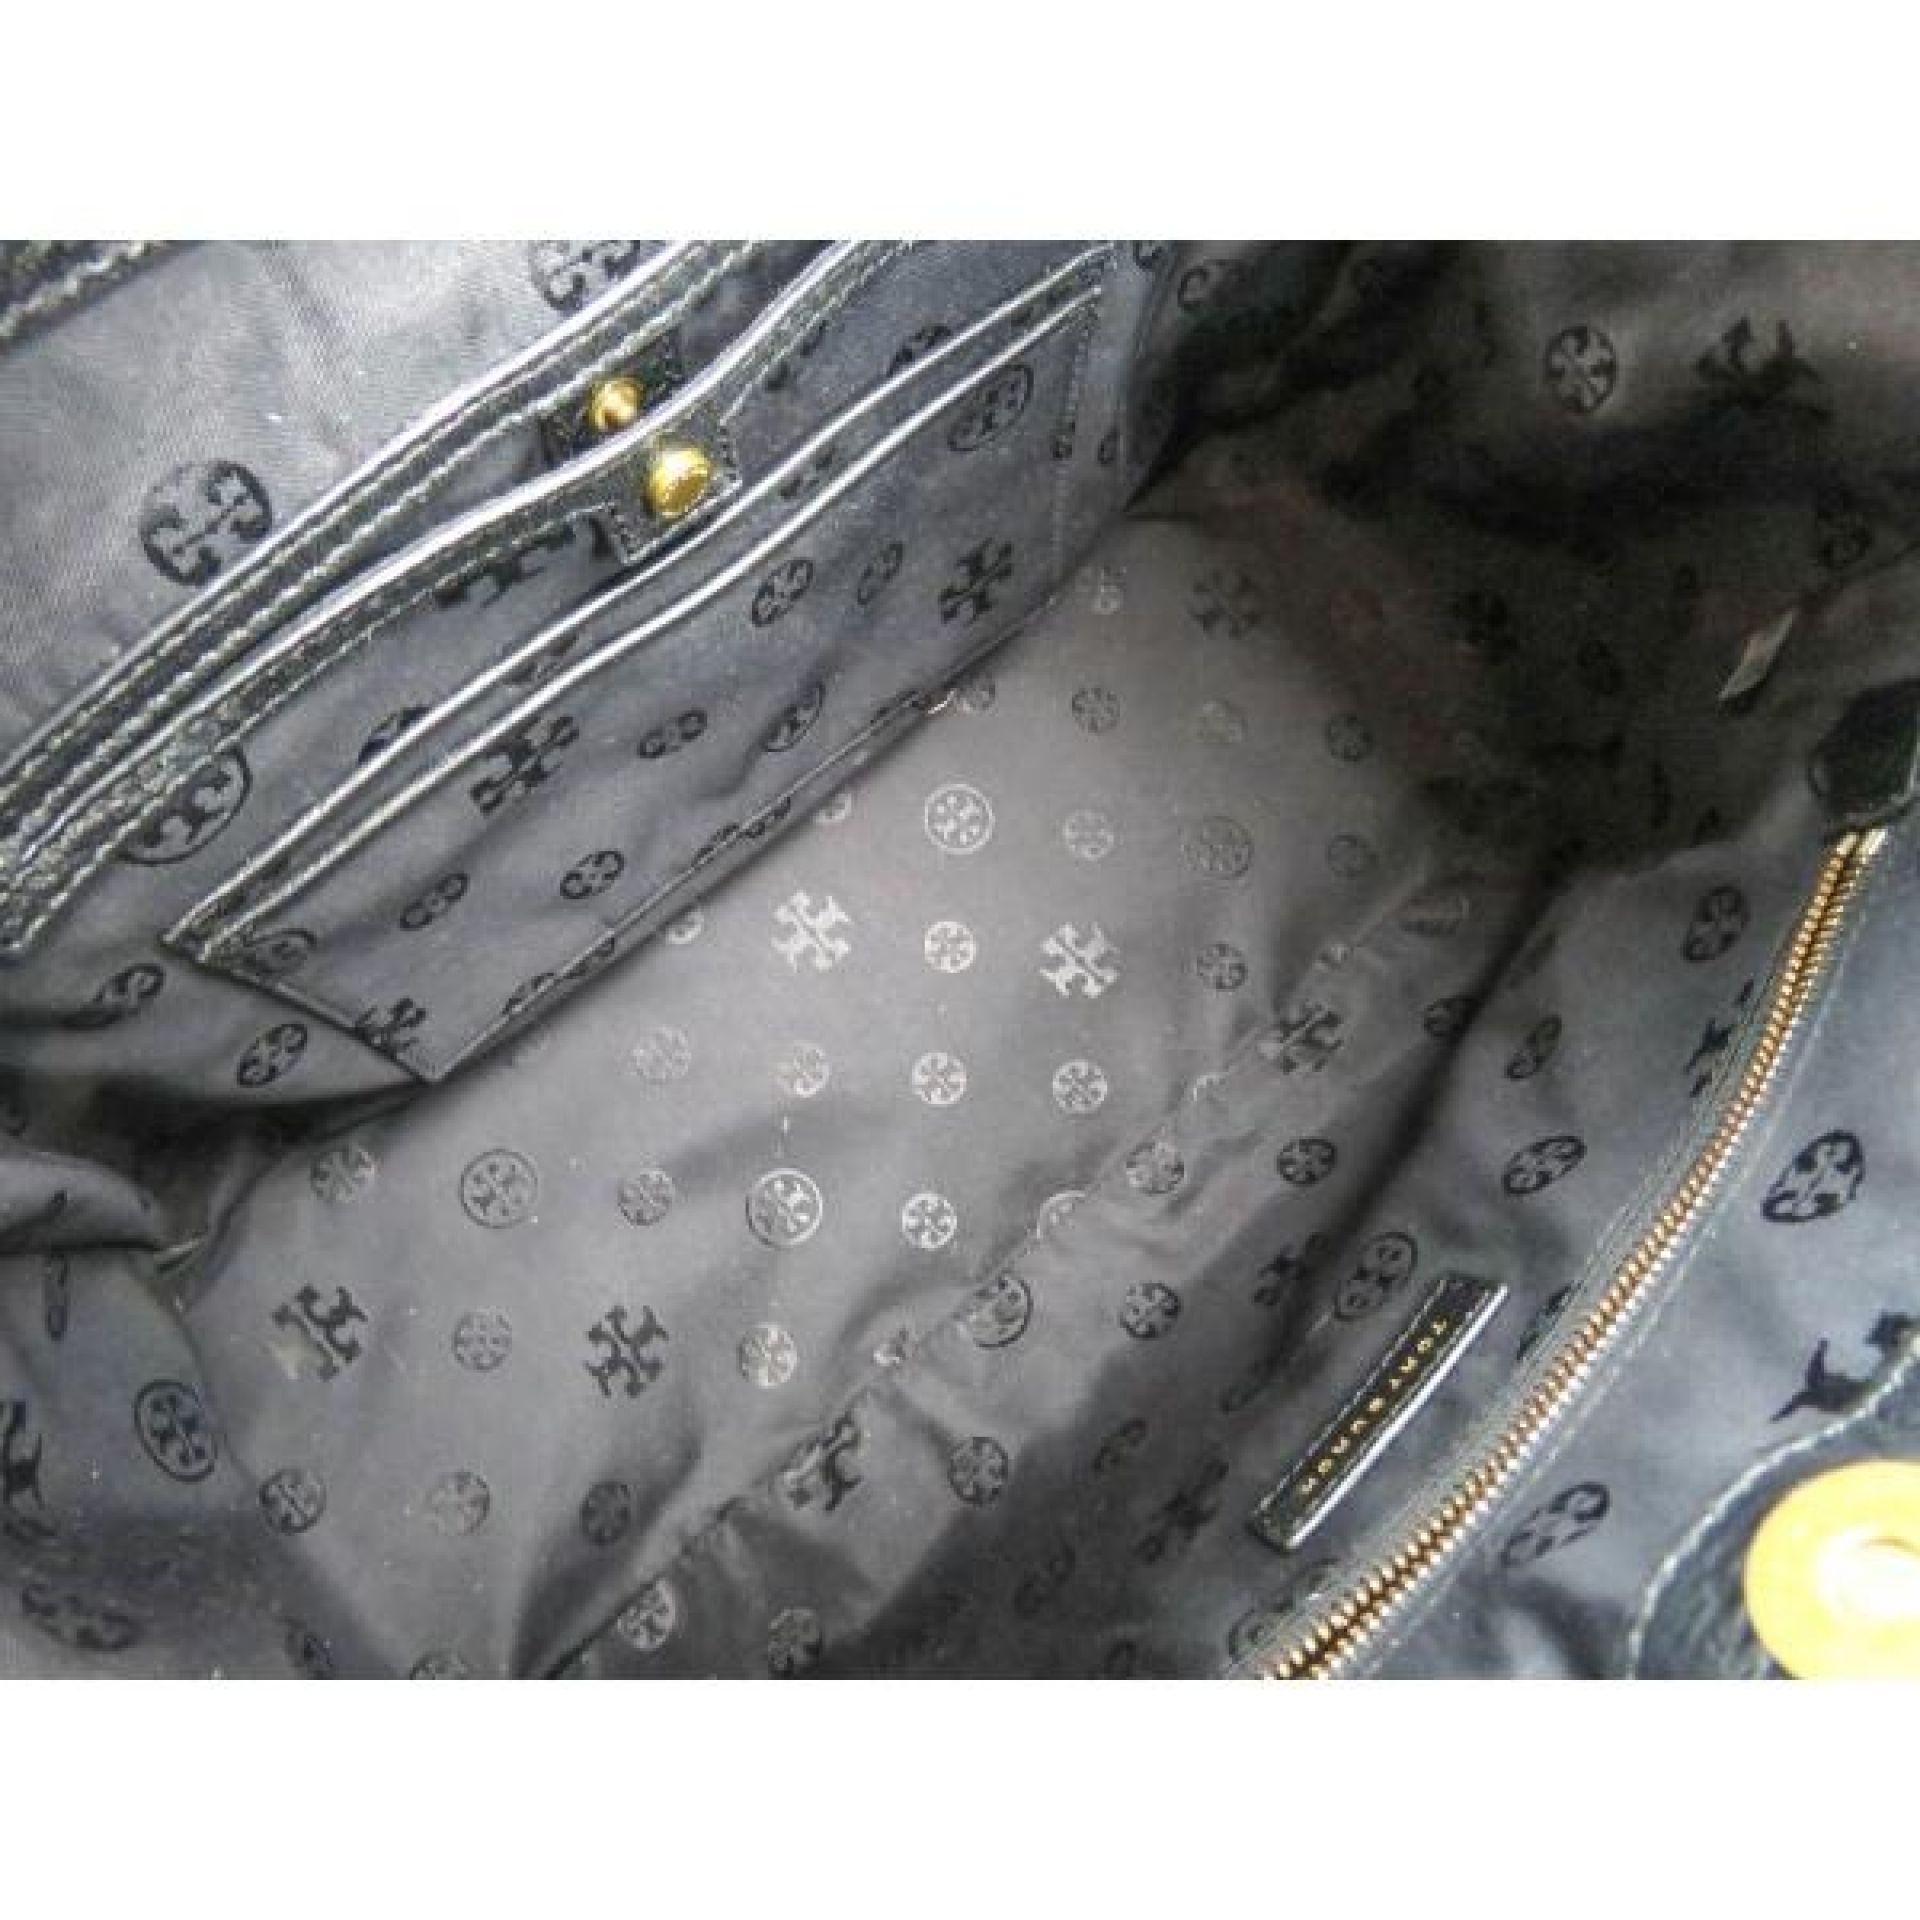 Tory Burch Black Pebbled Leather Frances Satchel Bag